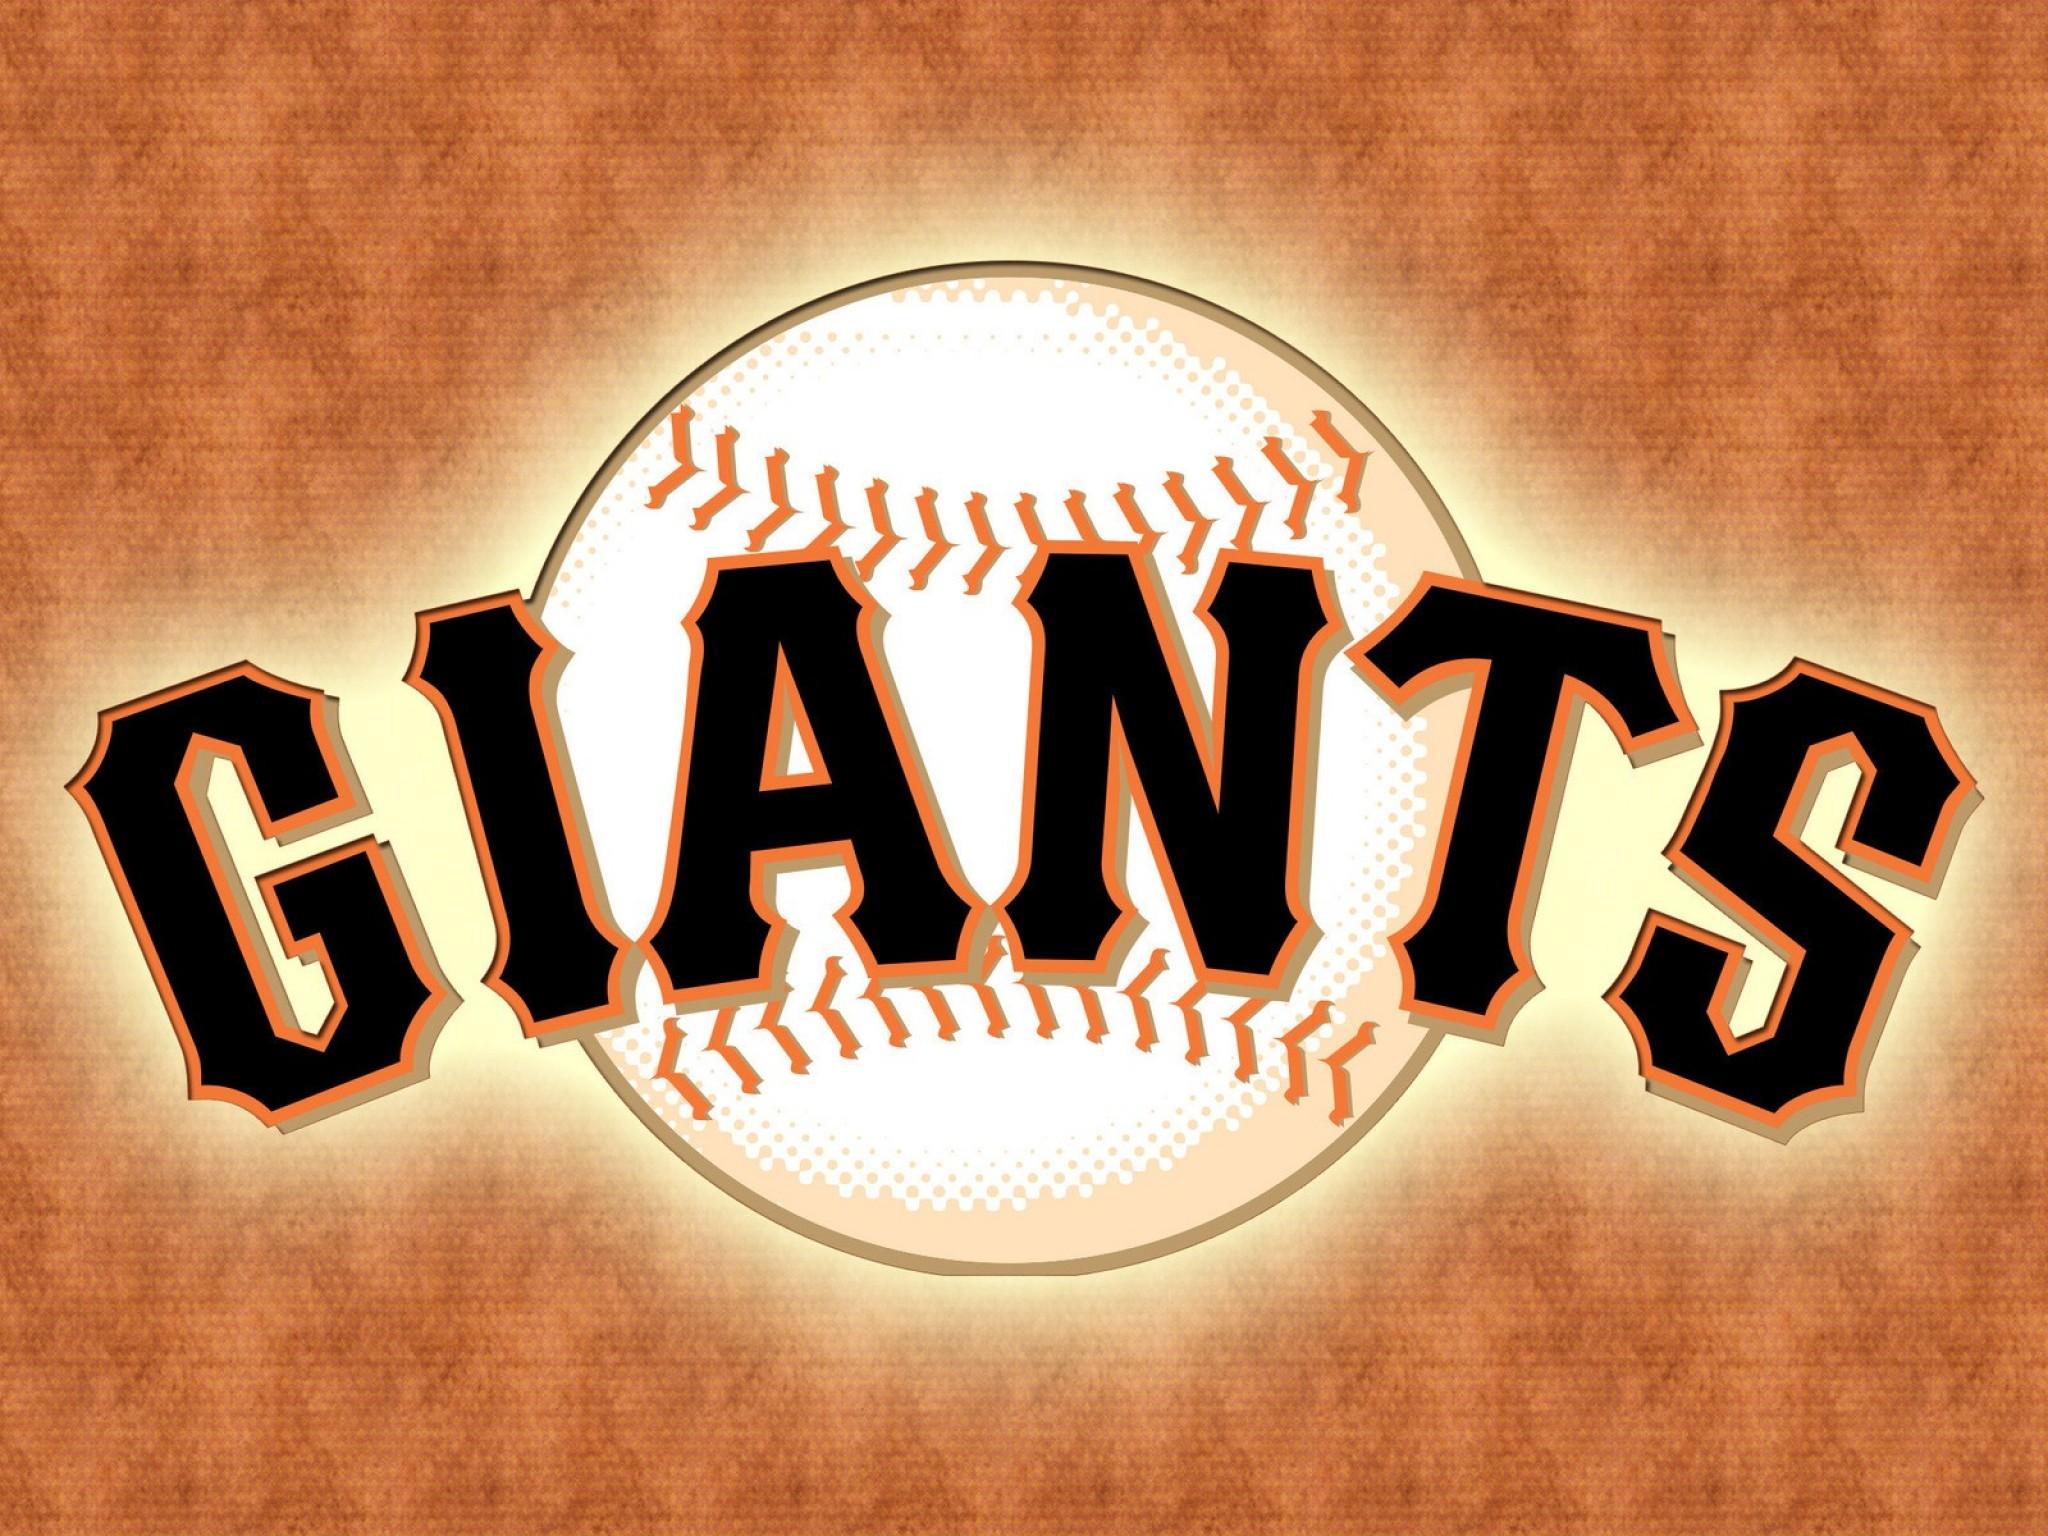 SAN FRANCISCO GIANTS Mlb Baseball (31) Wallpaper